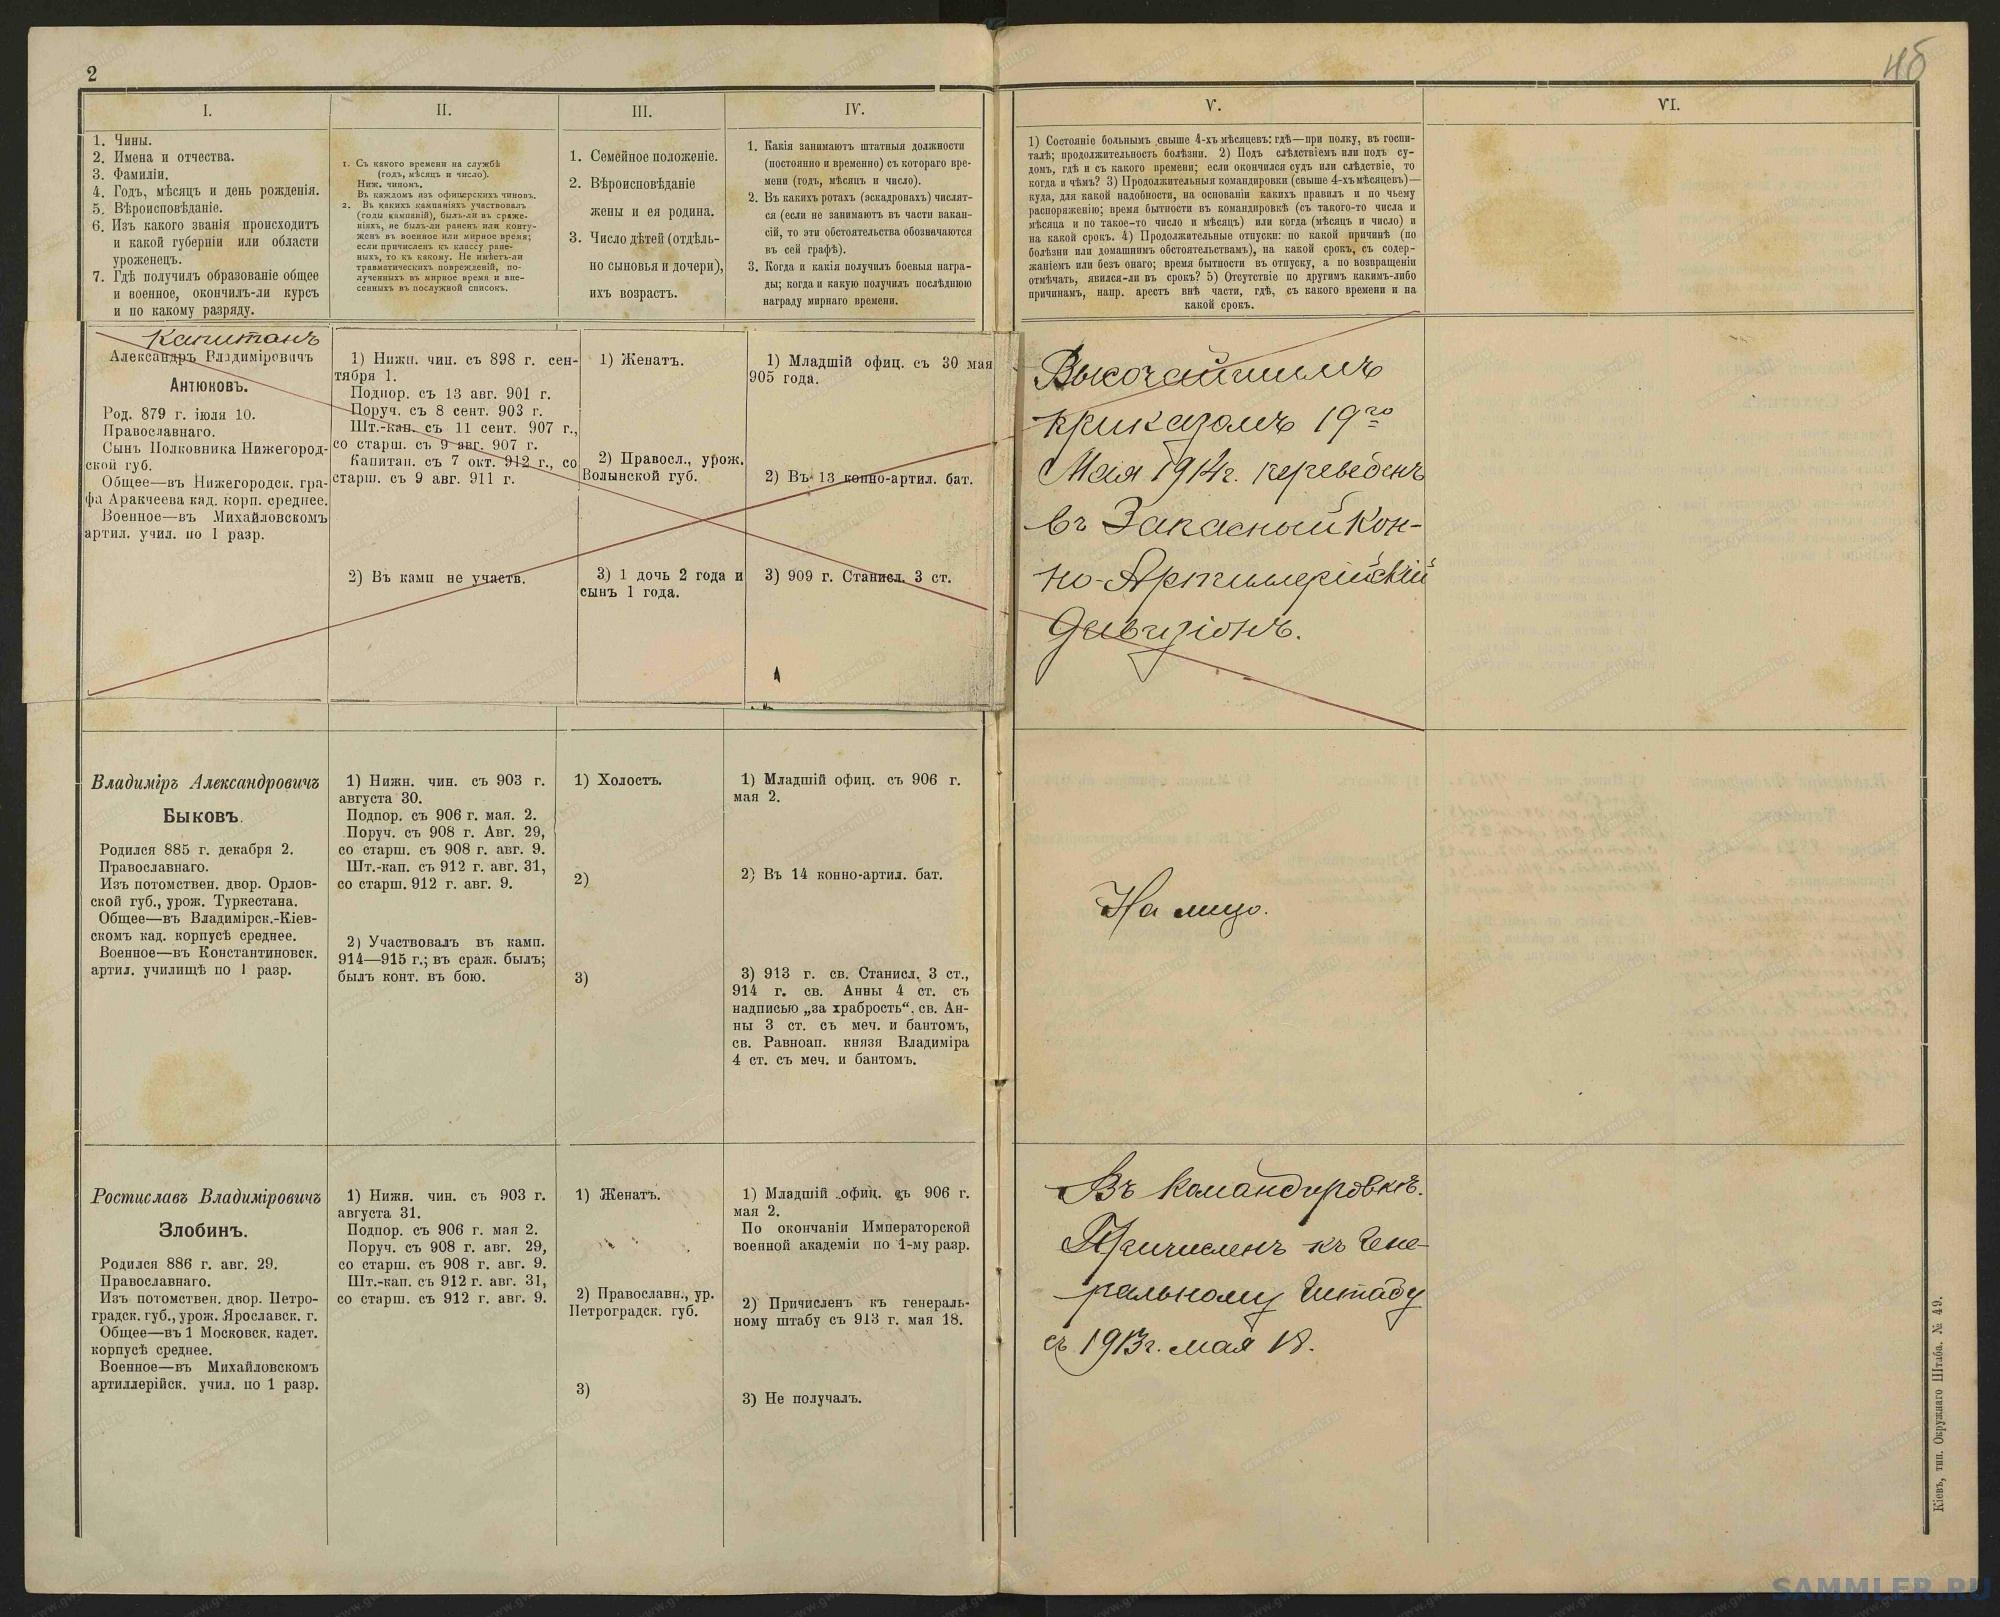 Список офицеров 7-го конно-артиллерийского дивизиона на 01.01.1915__05_.jpg